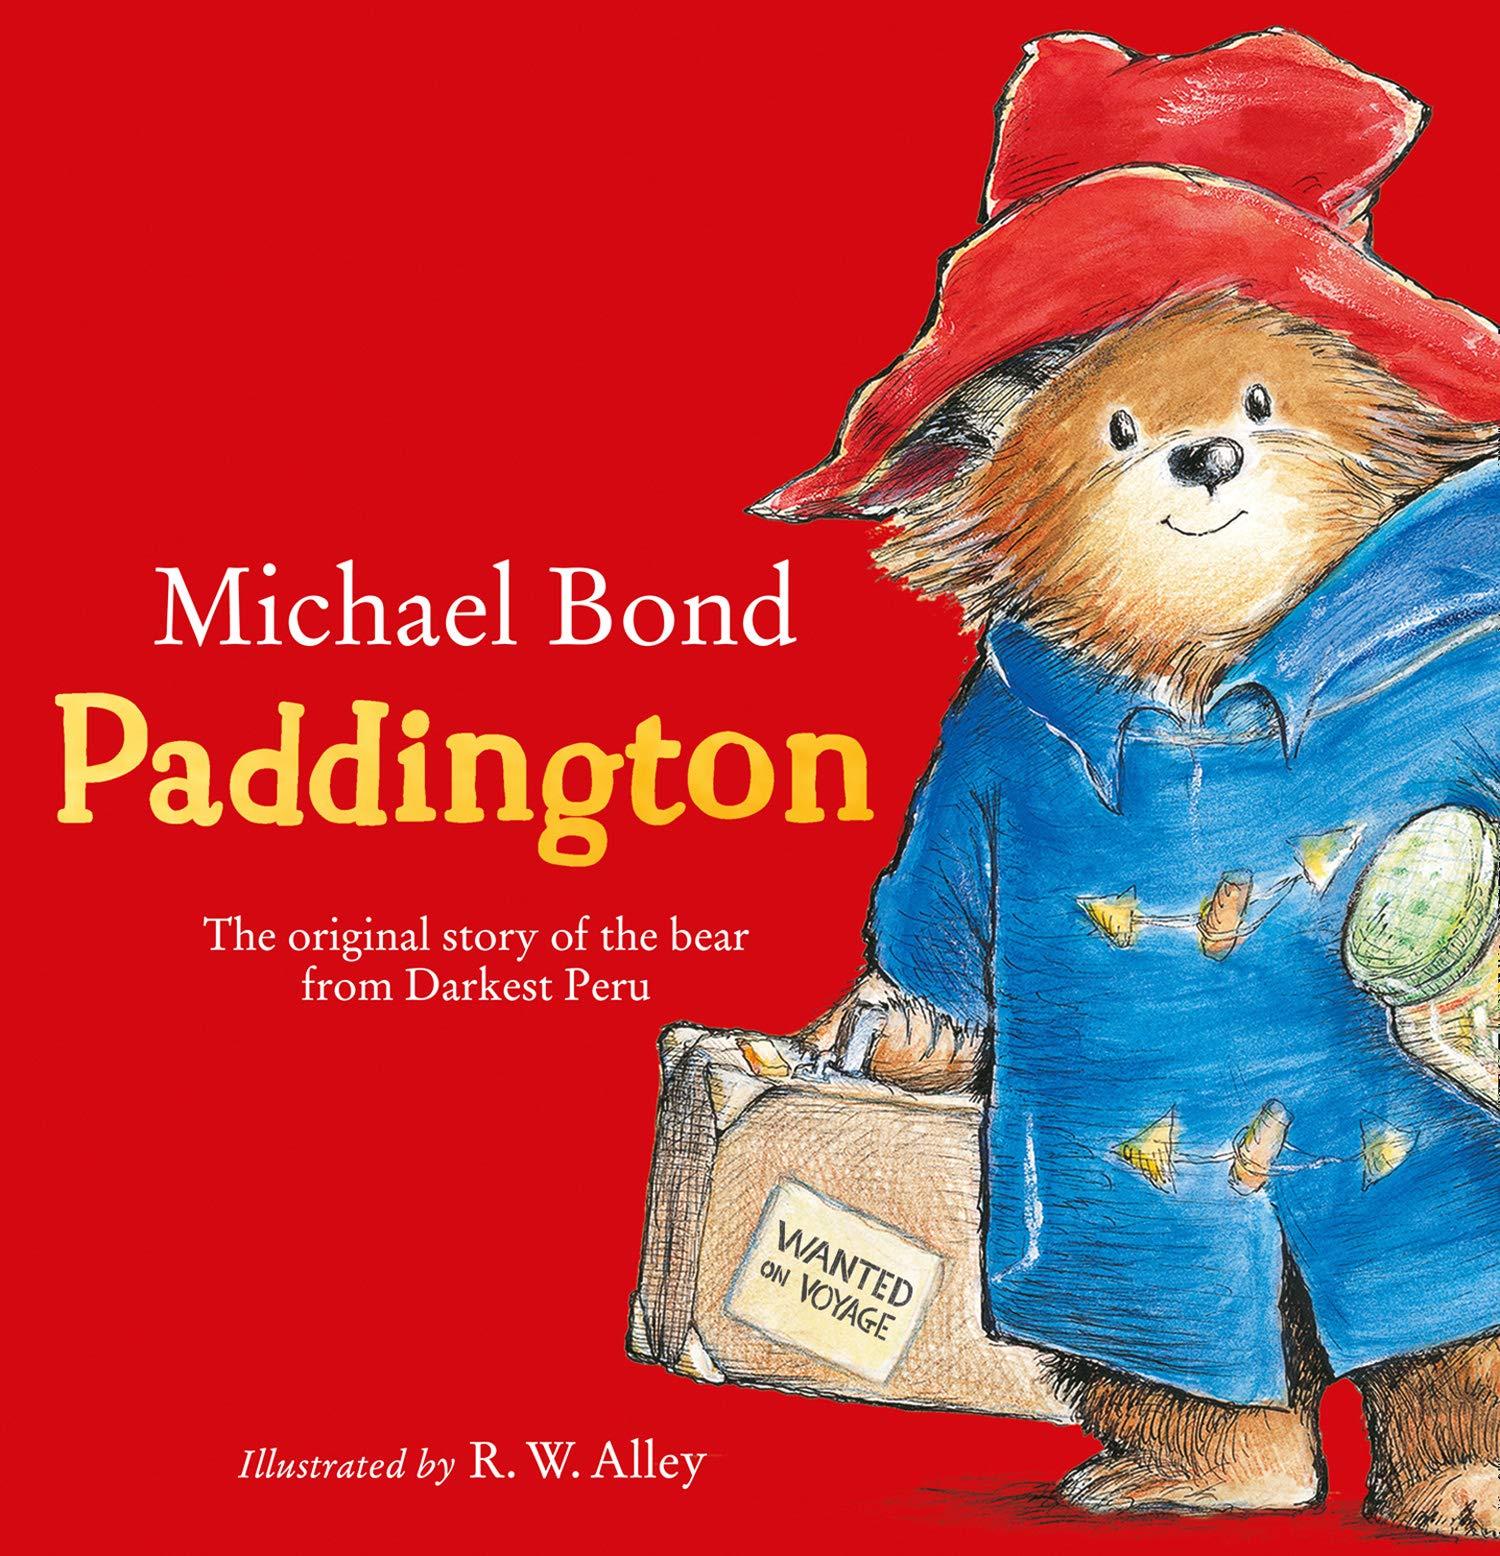 Paddington: The original story of the bear from Darkest Peru: Amazon.co.uk: Bond, Michael, Alley, R. W.: Books